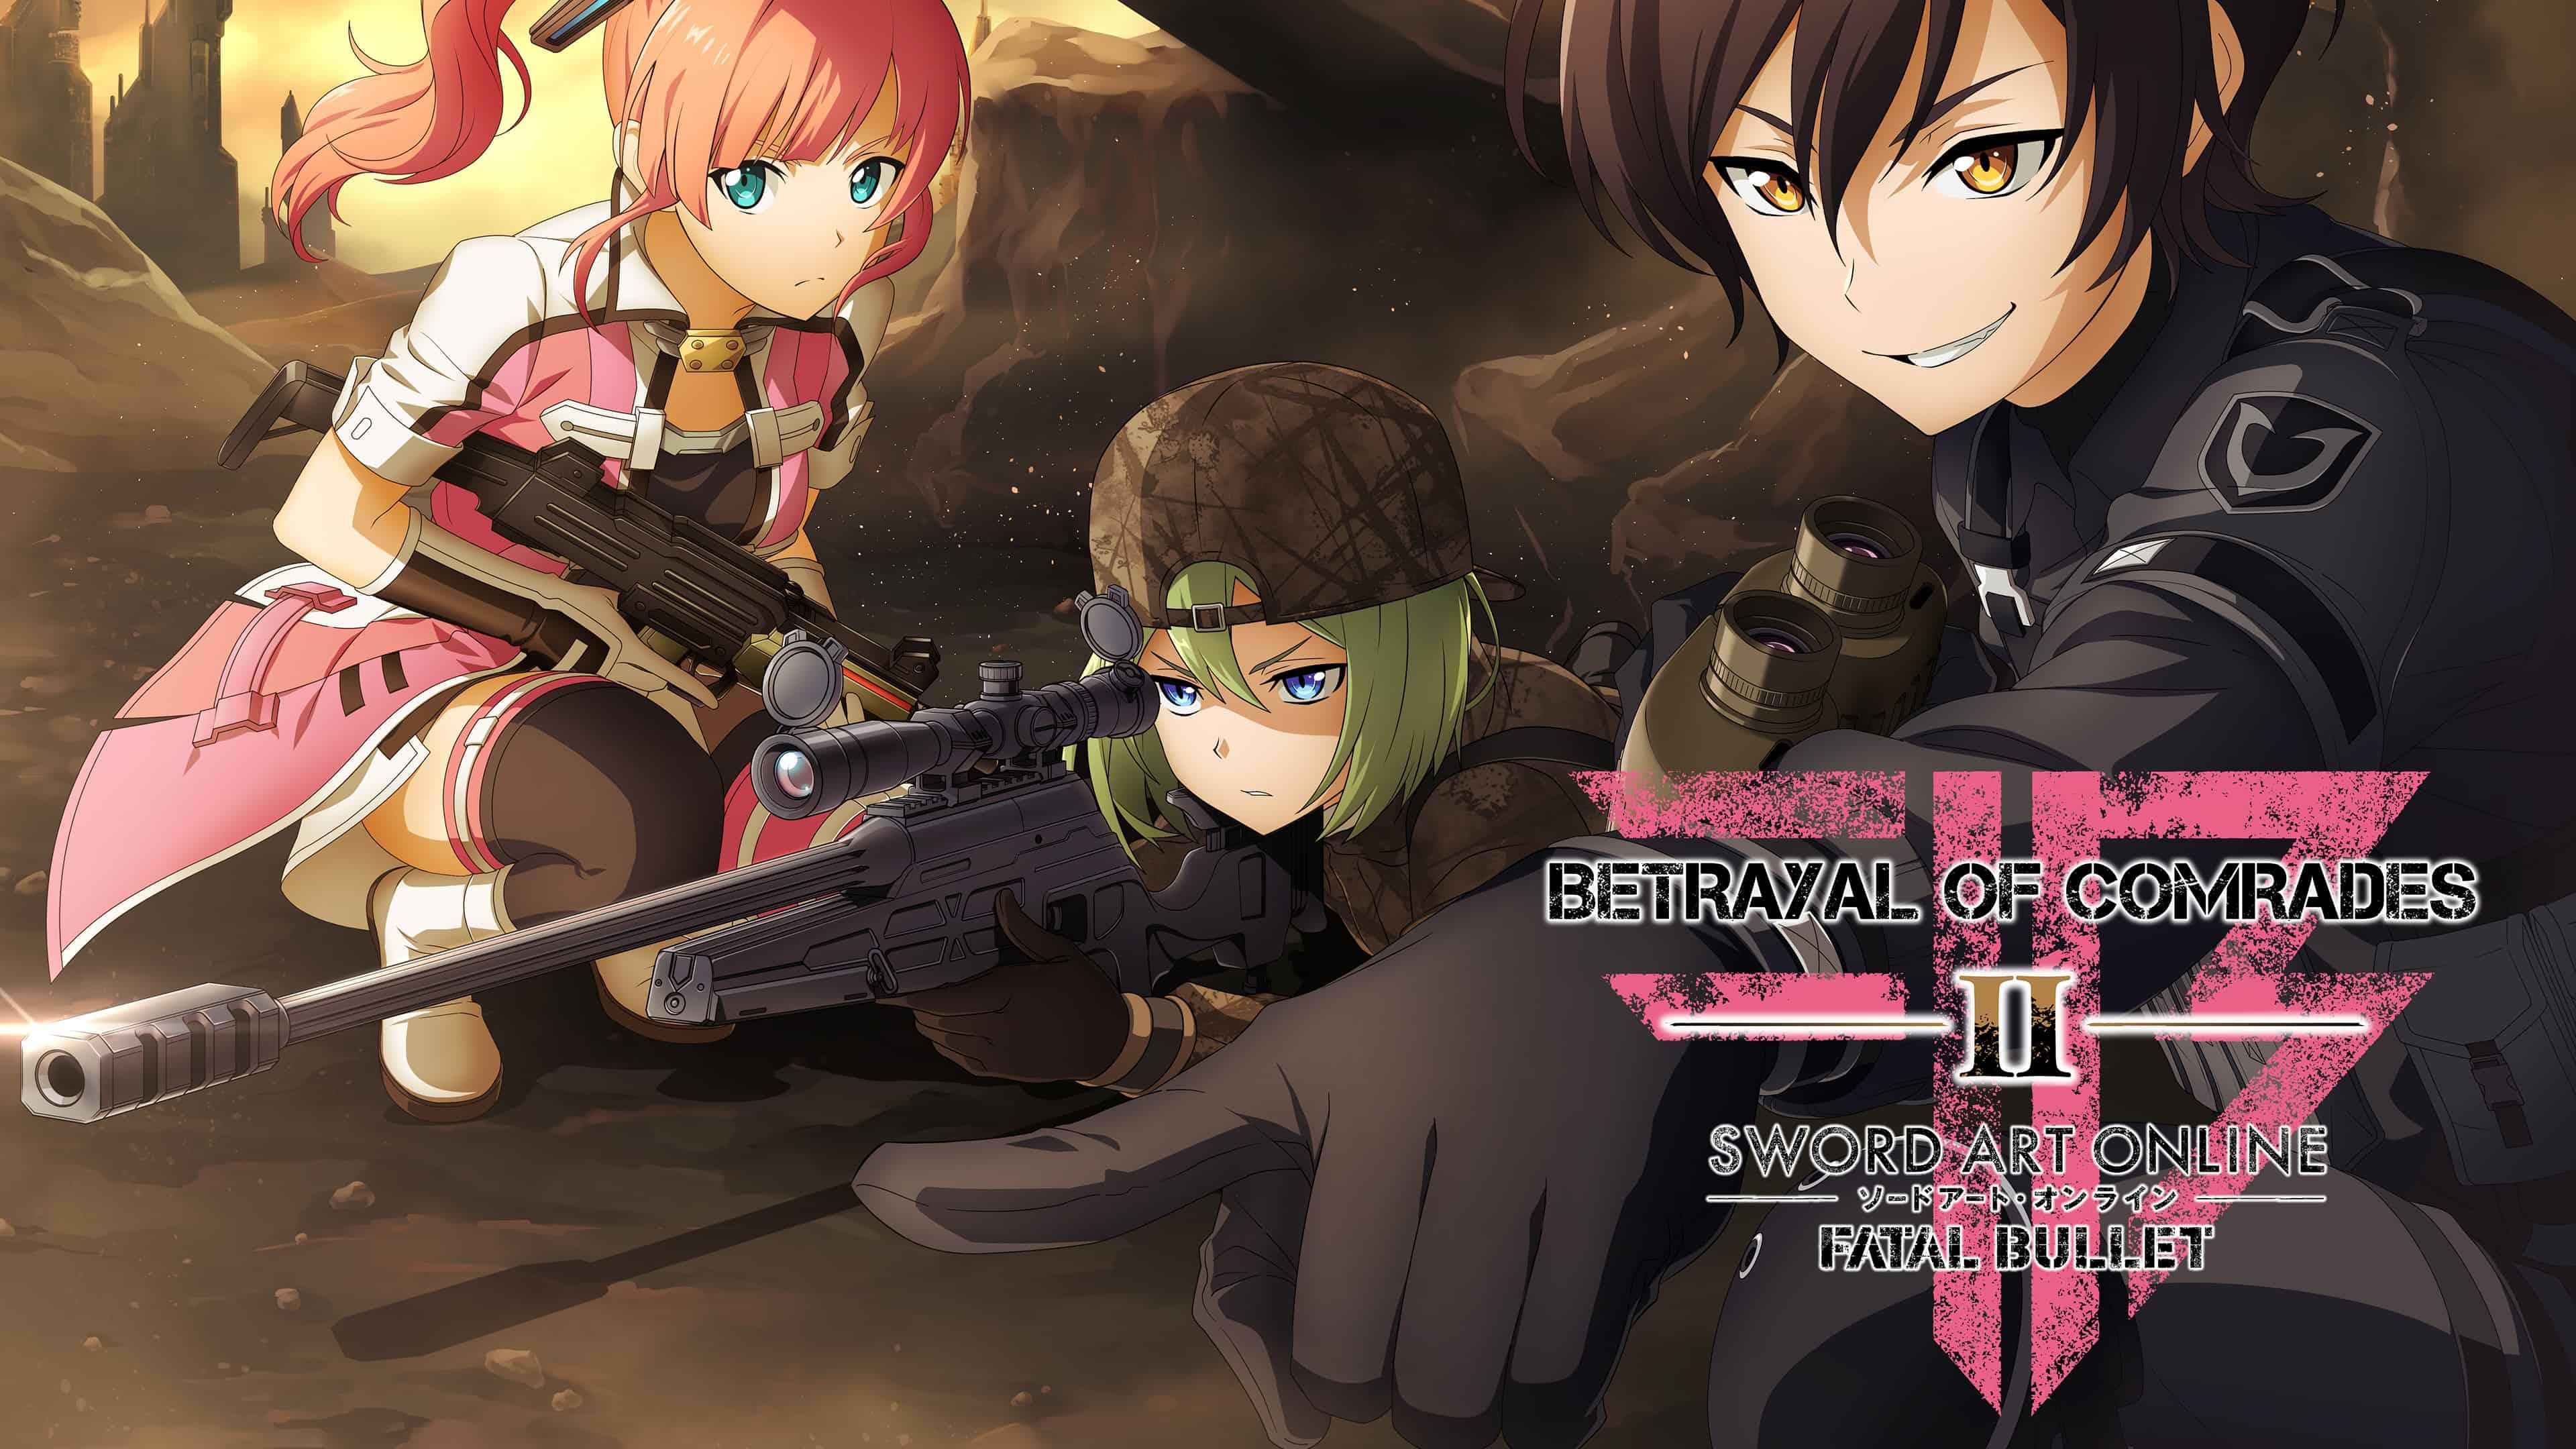 sword art online fatal bullet betrayal of comrades uhd 4k wallpaper